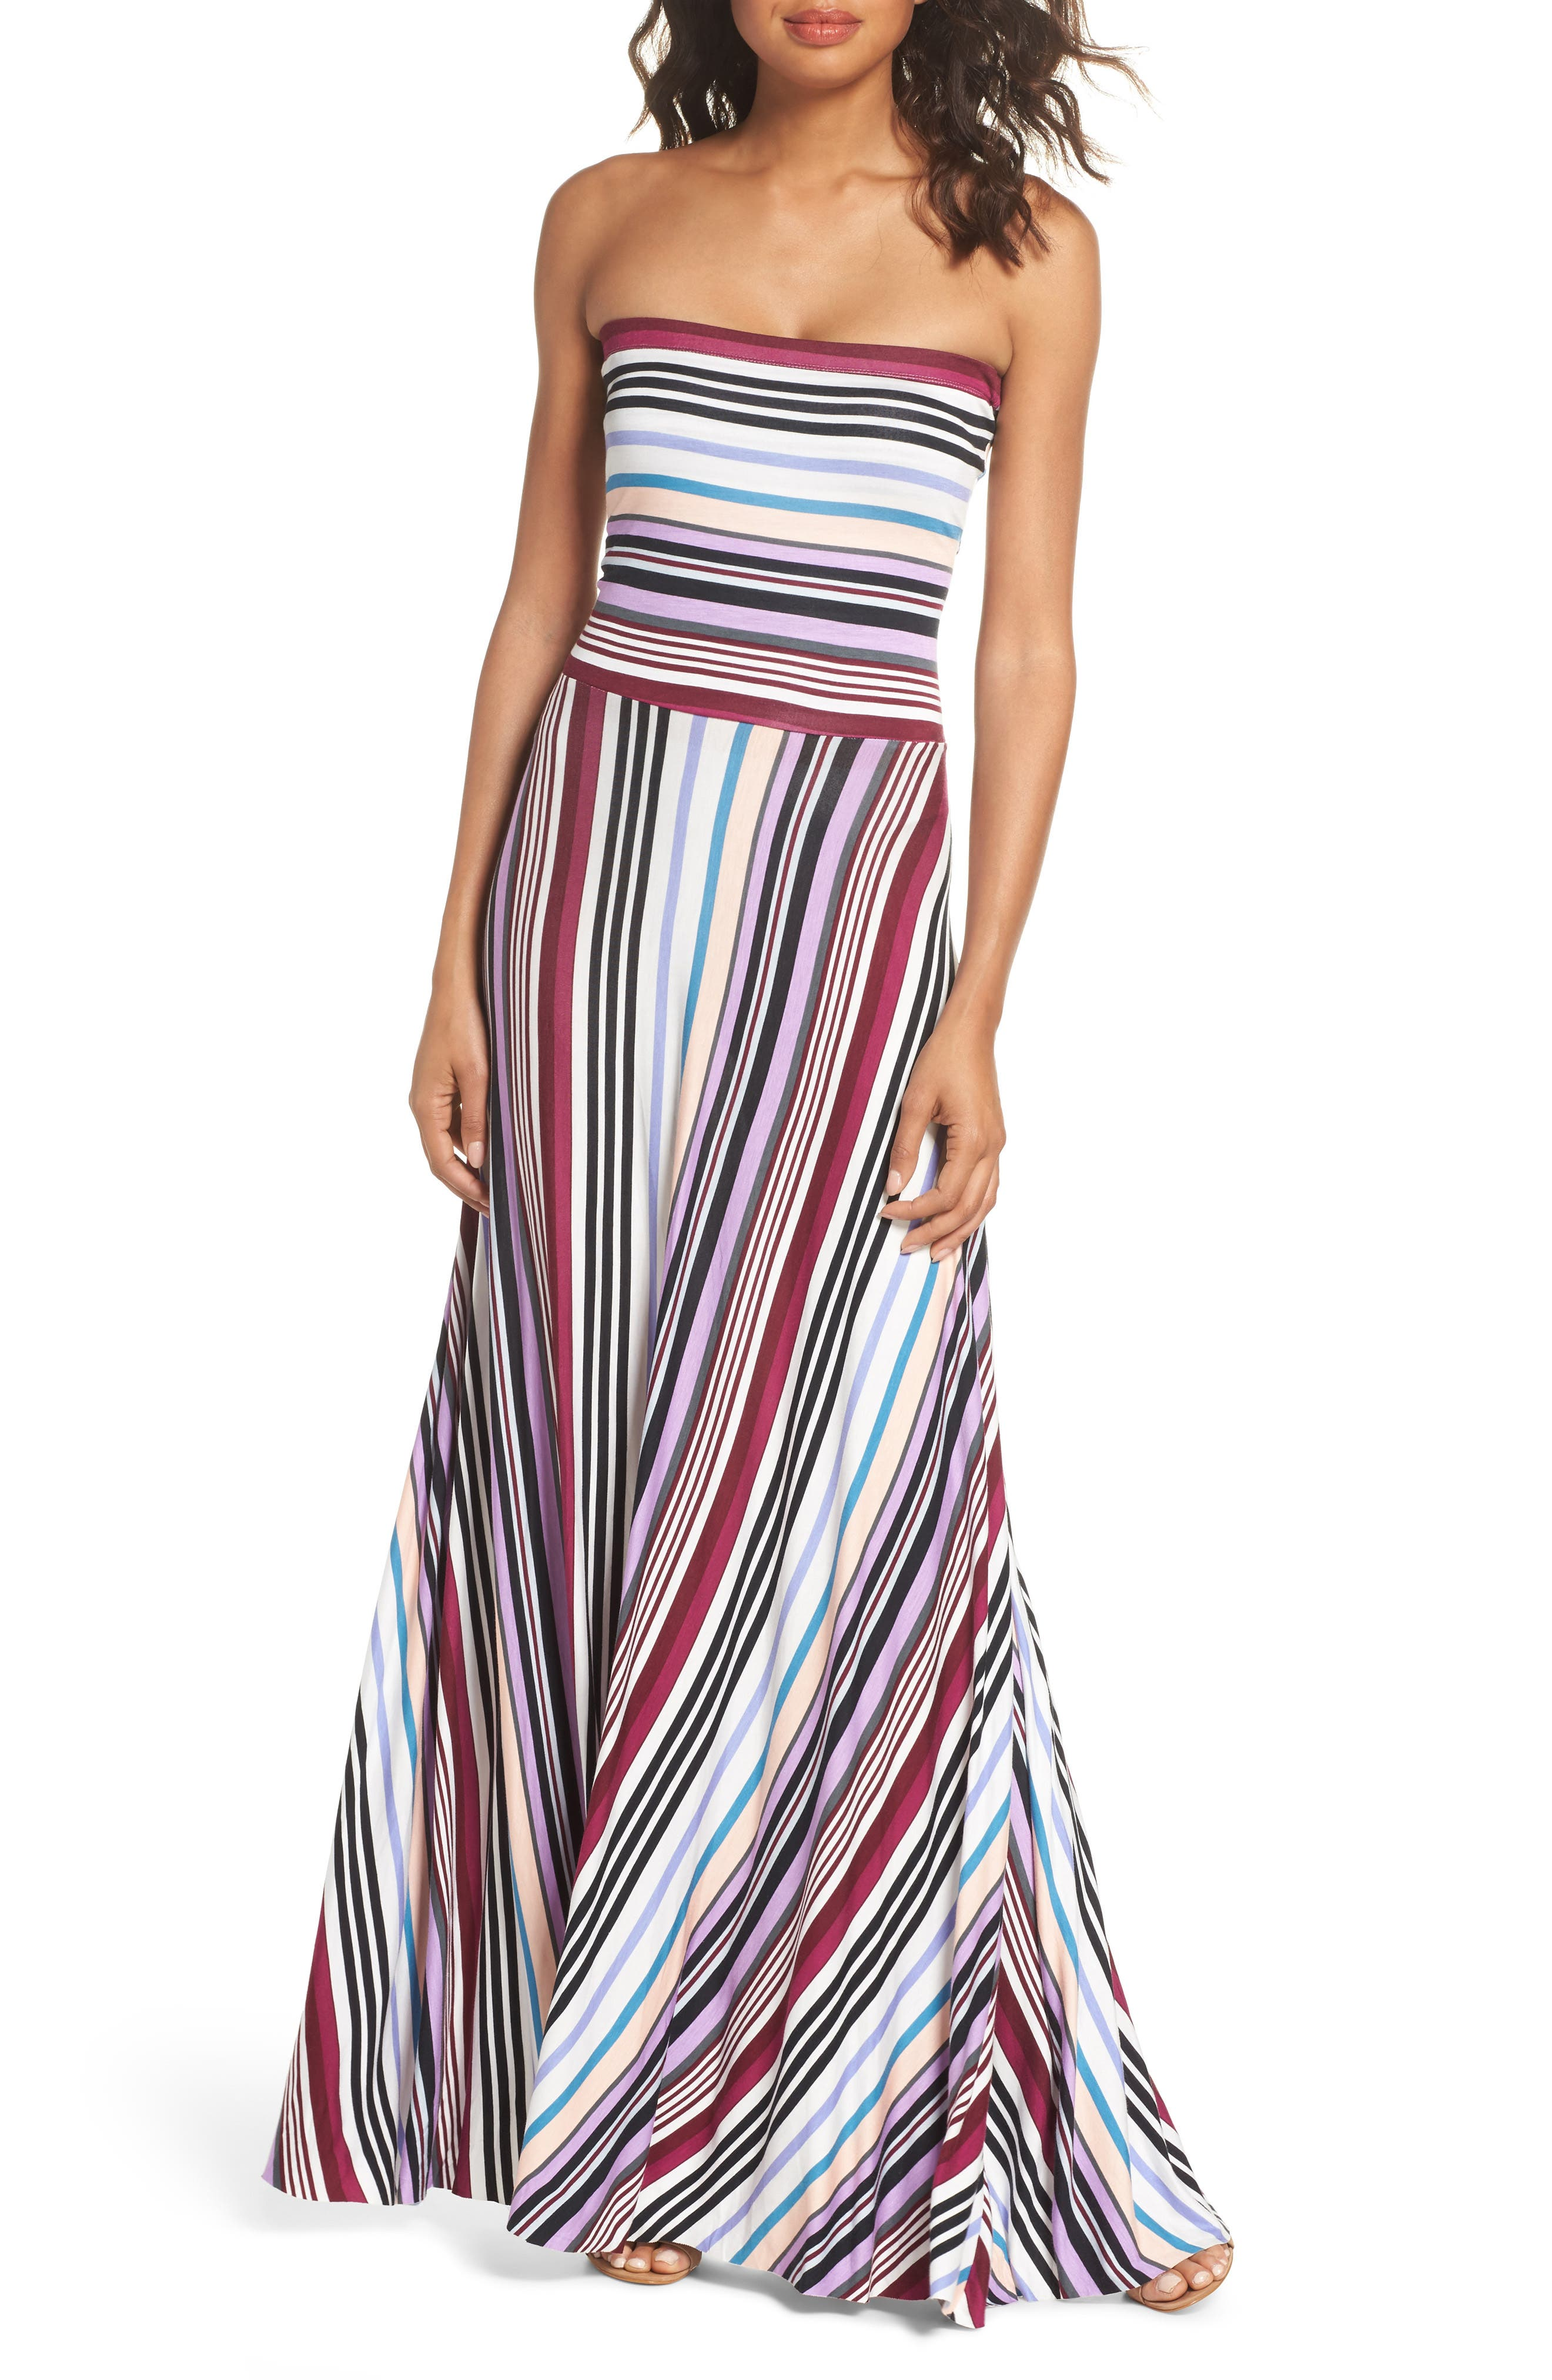 Clemette Strapless Maxi Dress,                             Main thumbnail 1, color,                             Purple Multi Stripe